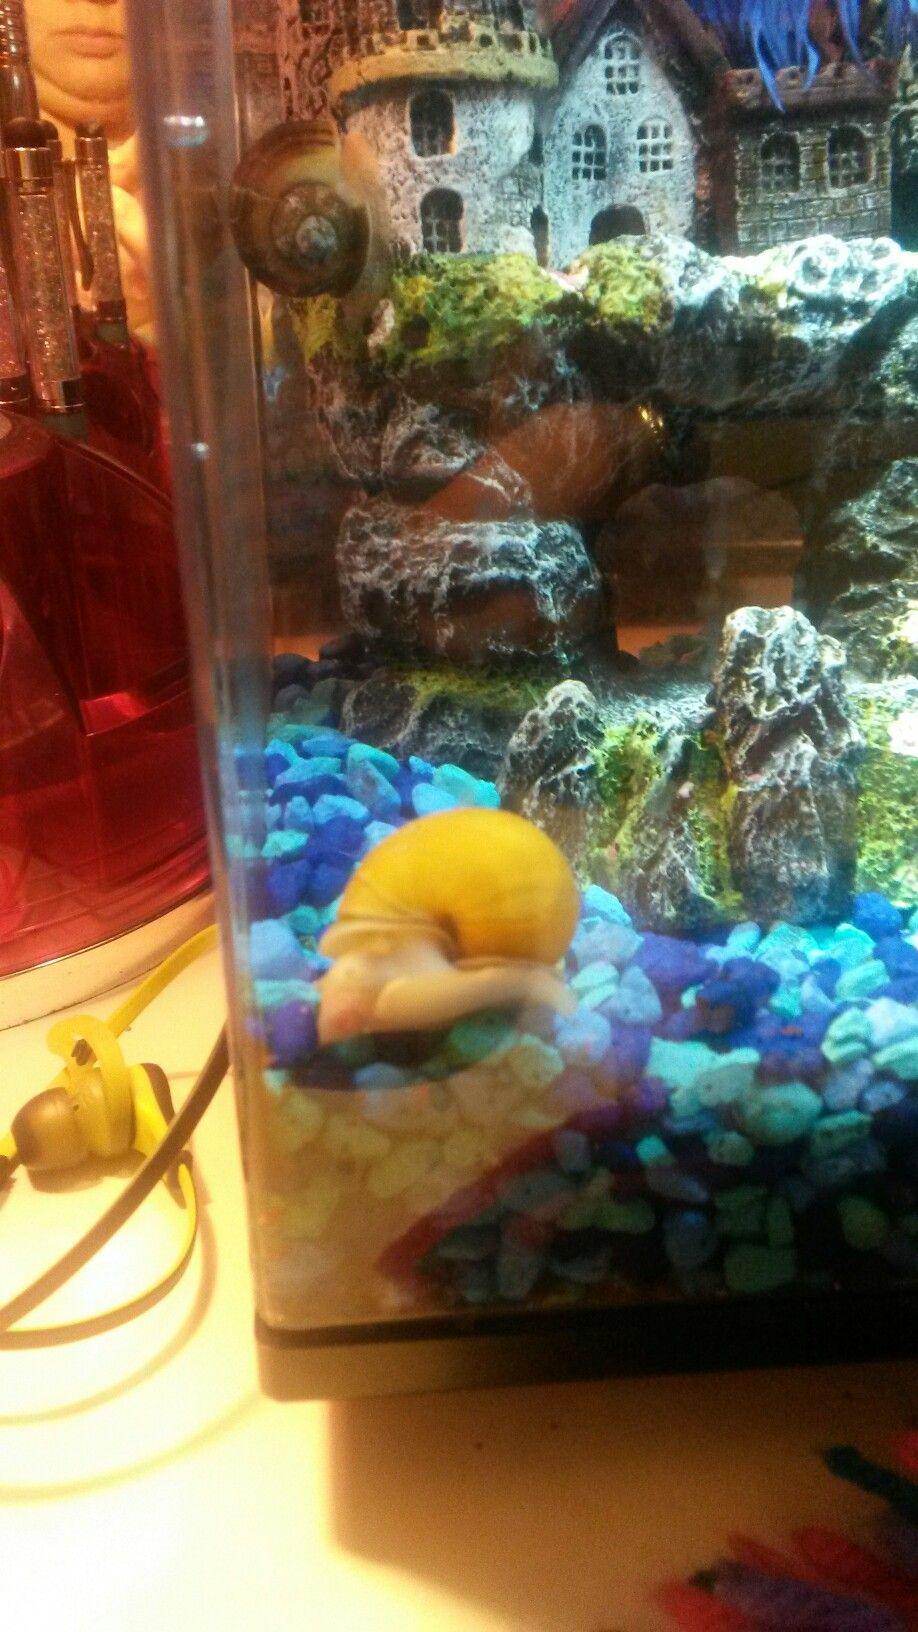 Freshwater aquarium fish jacksonville fl - Golden Mystery Snail Snailsaquarium Fish